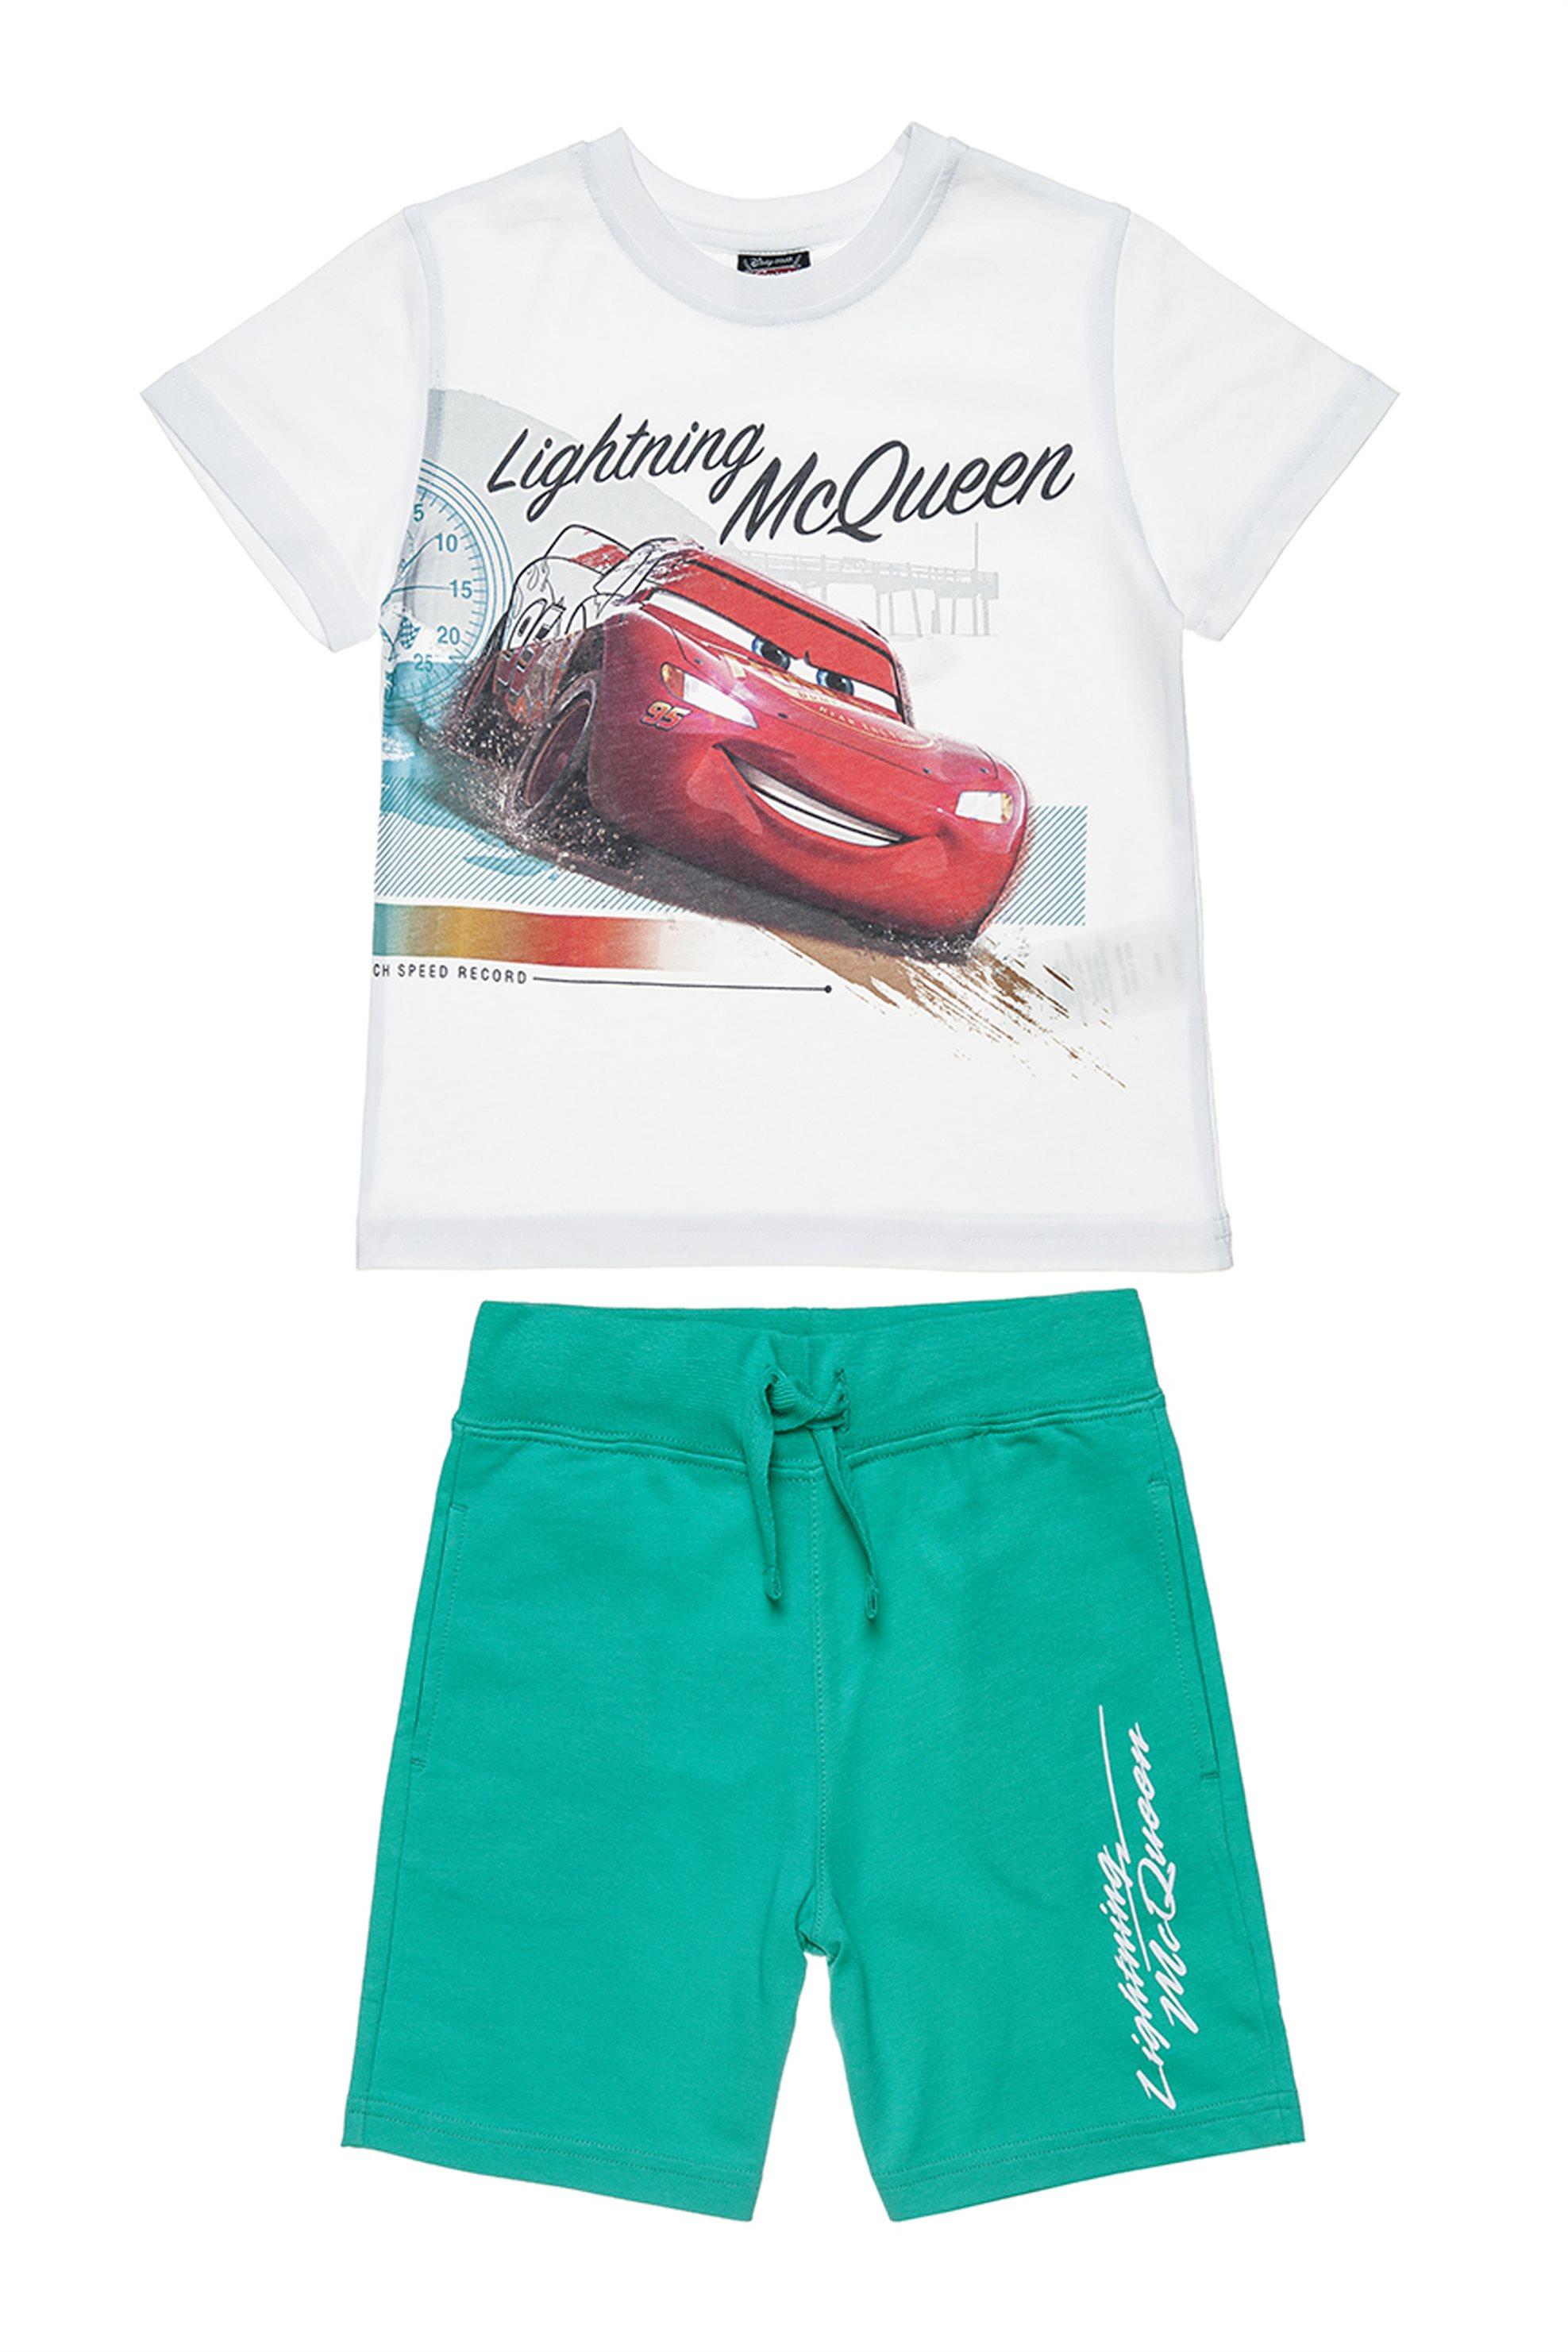 09cef165026 Αlouette παιδικό σετ T-shirt με τύπωμα και βερμούδα Disney Cars McQueen (2-